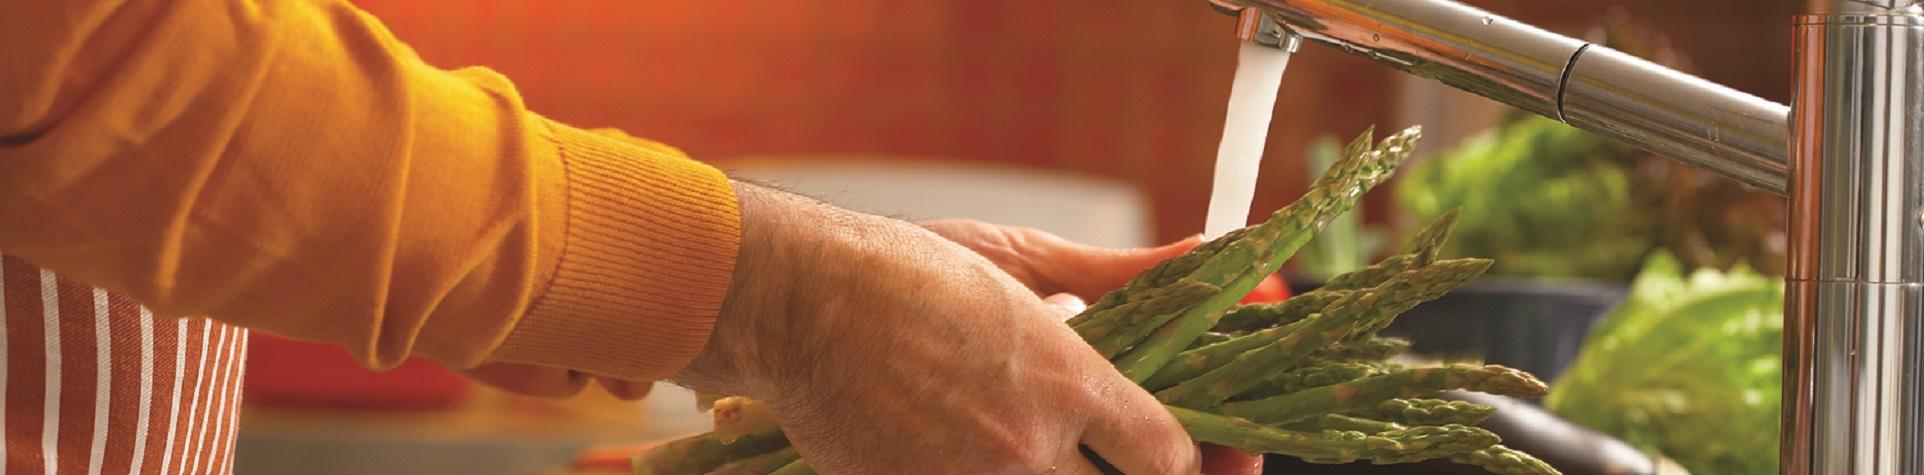 homeowner washes vegetables under kitchen tap